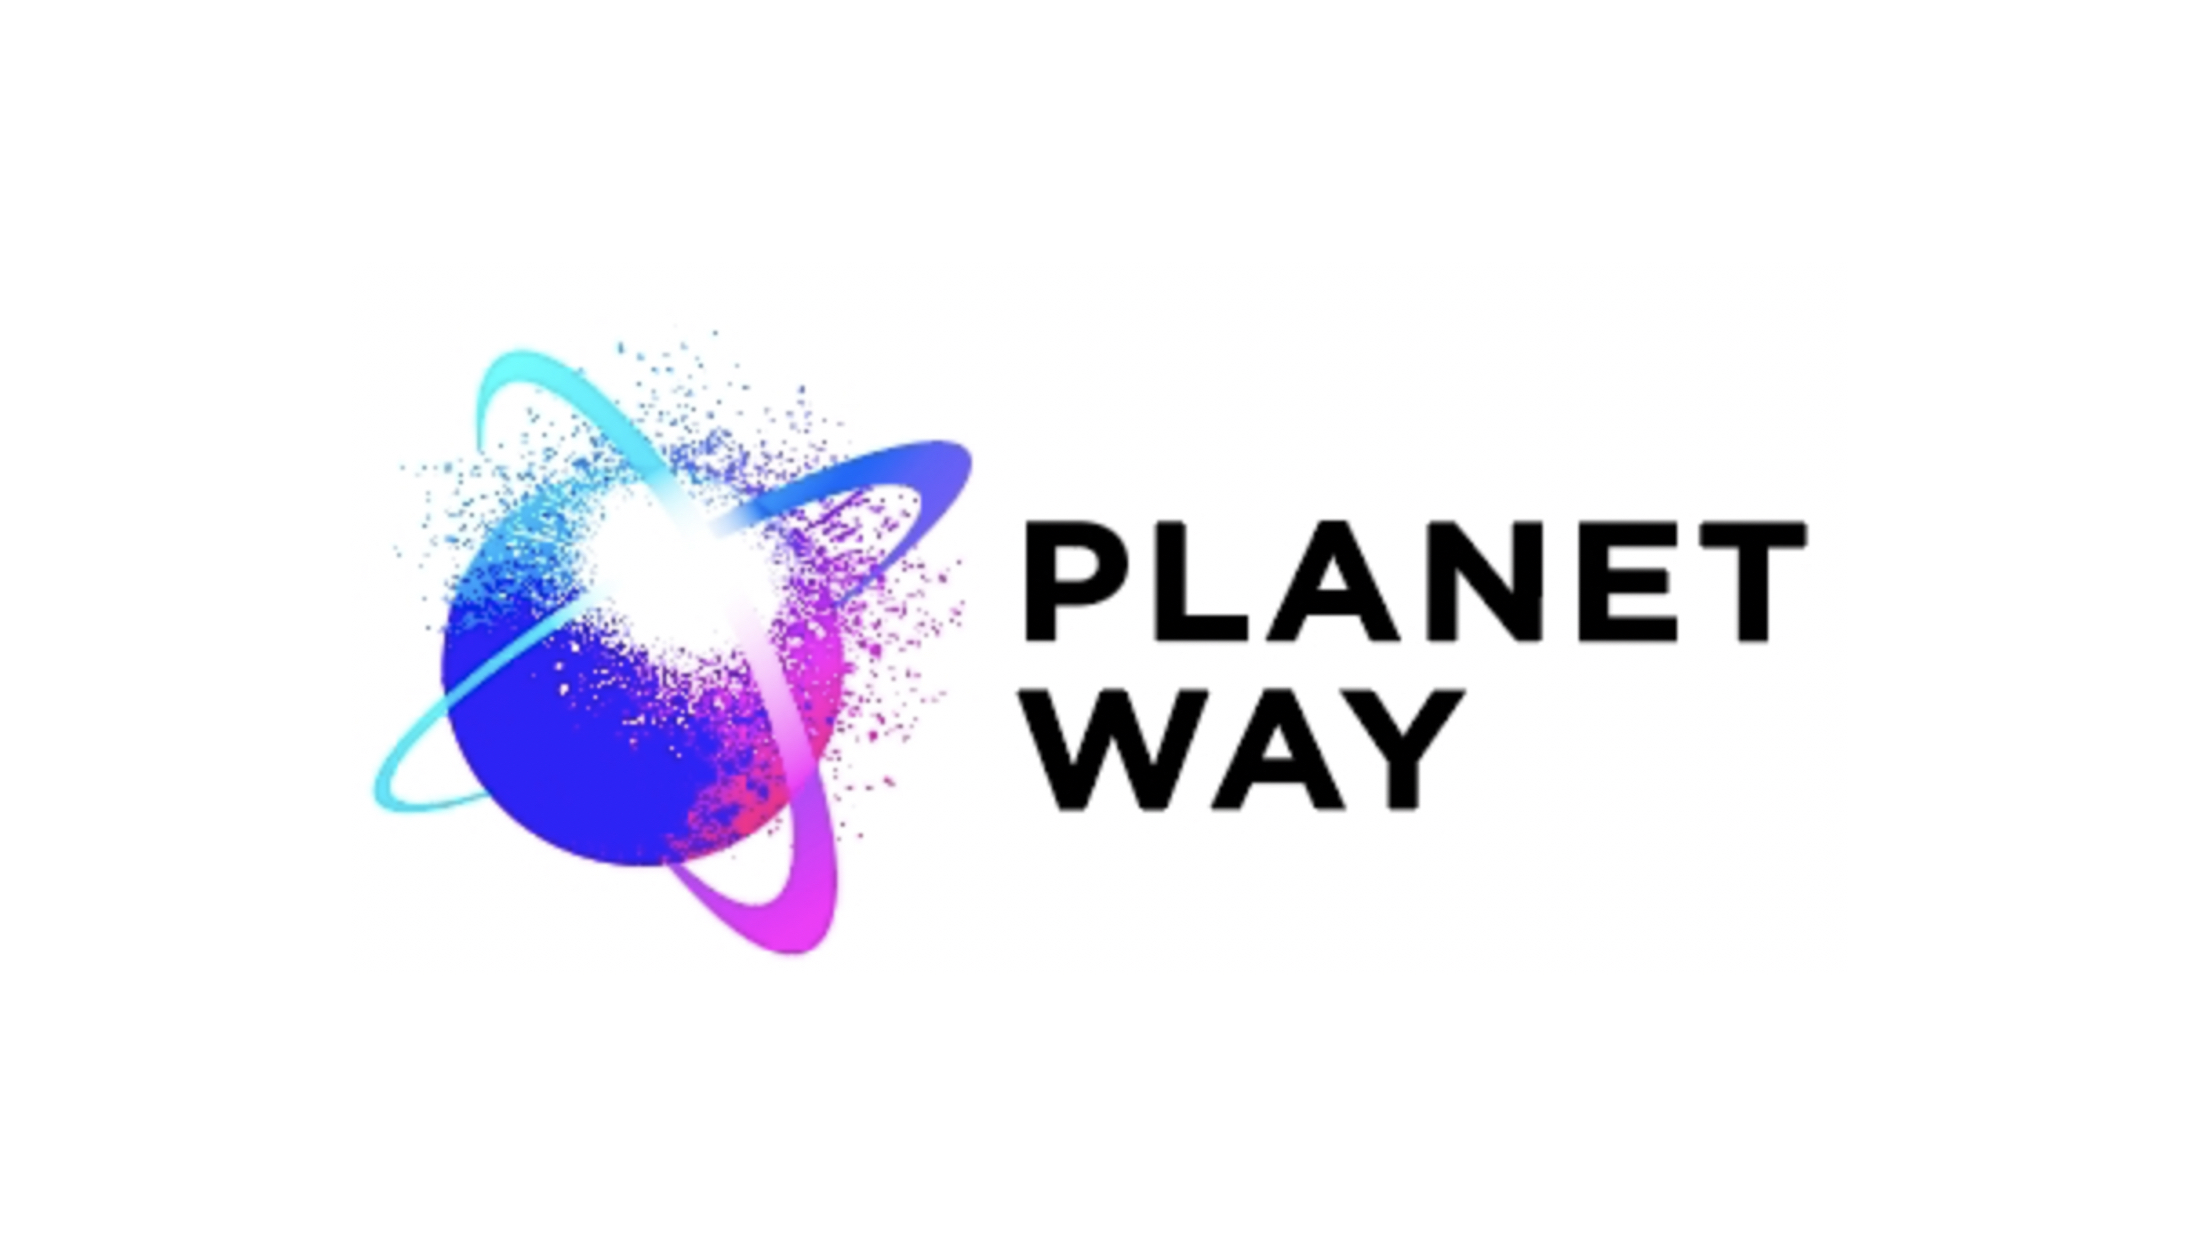 Planetway×ブロックチェーンロック | カーシェア事業に関する実証実験を完了